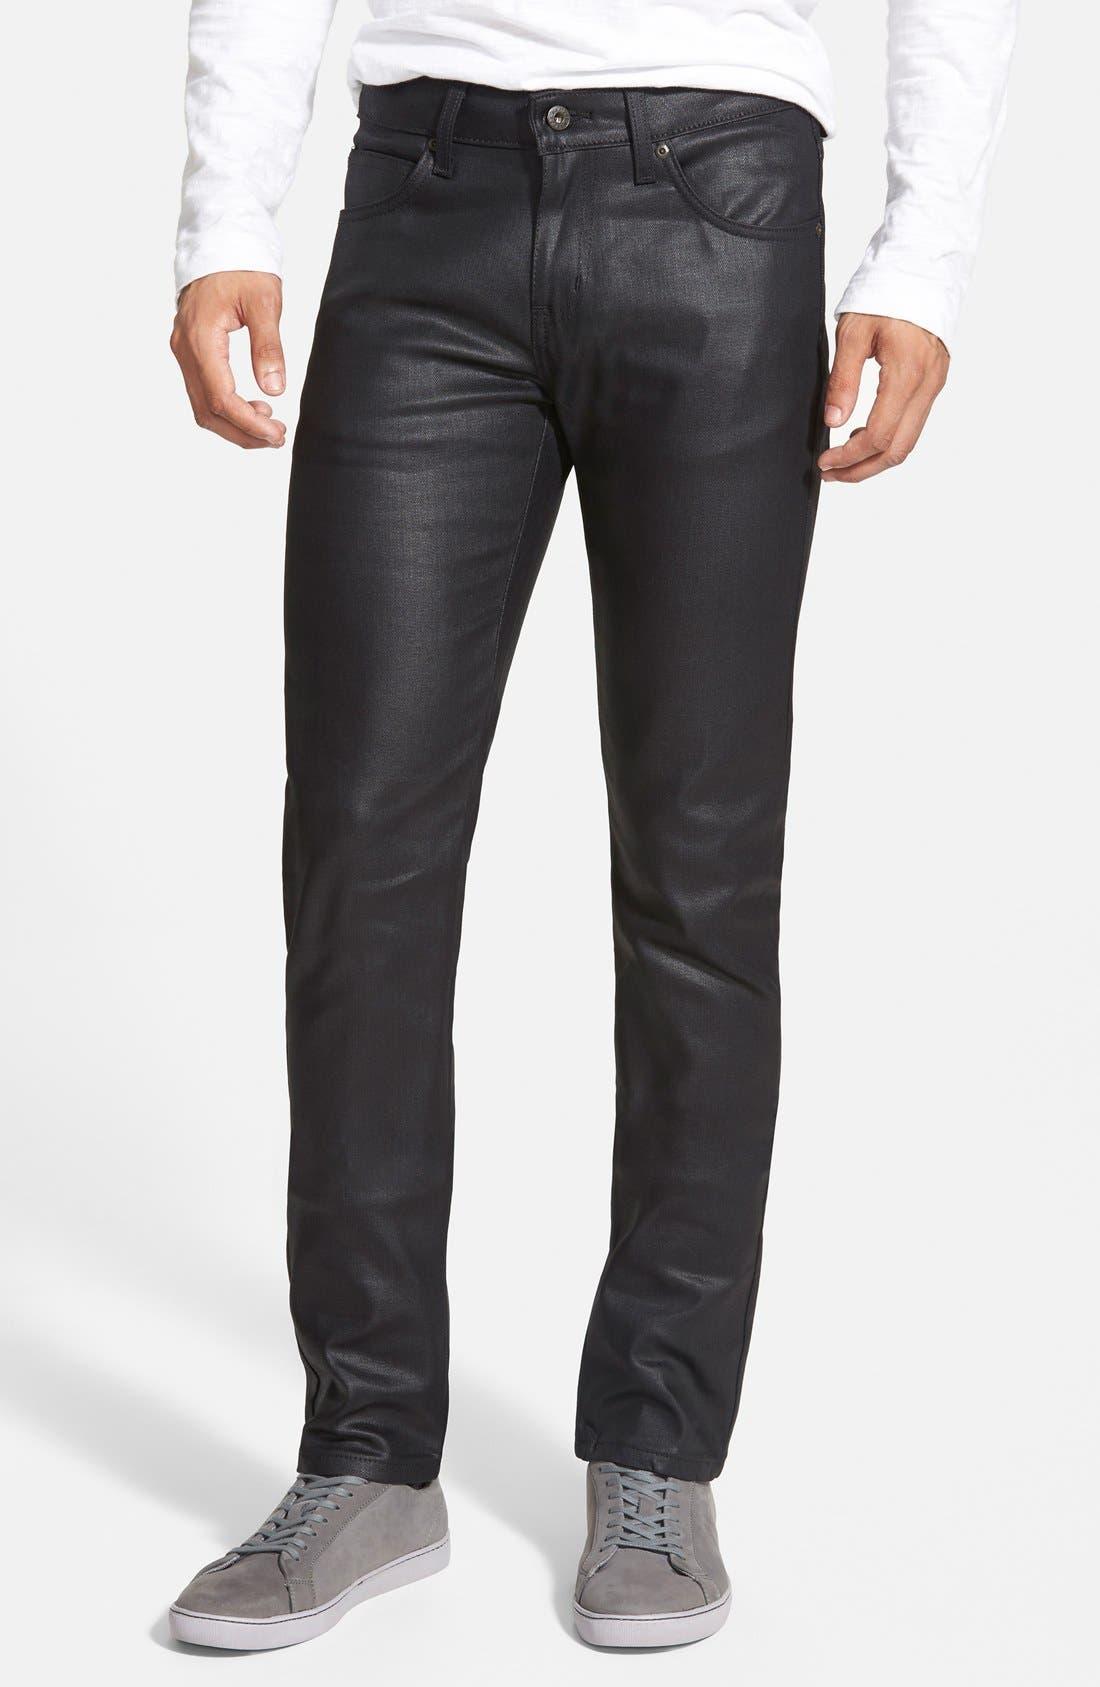 Super Skinny Guy Skinny Stretch Jeans,                         Main,                         color, Black